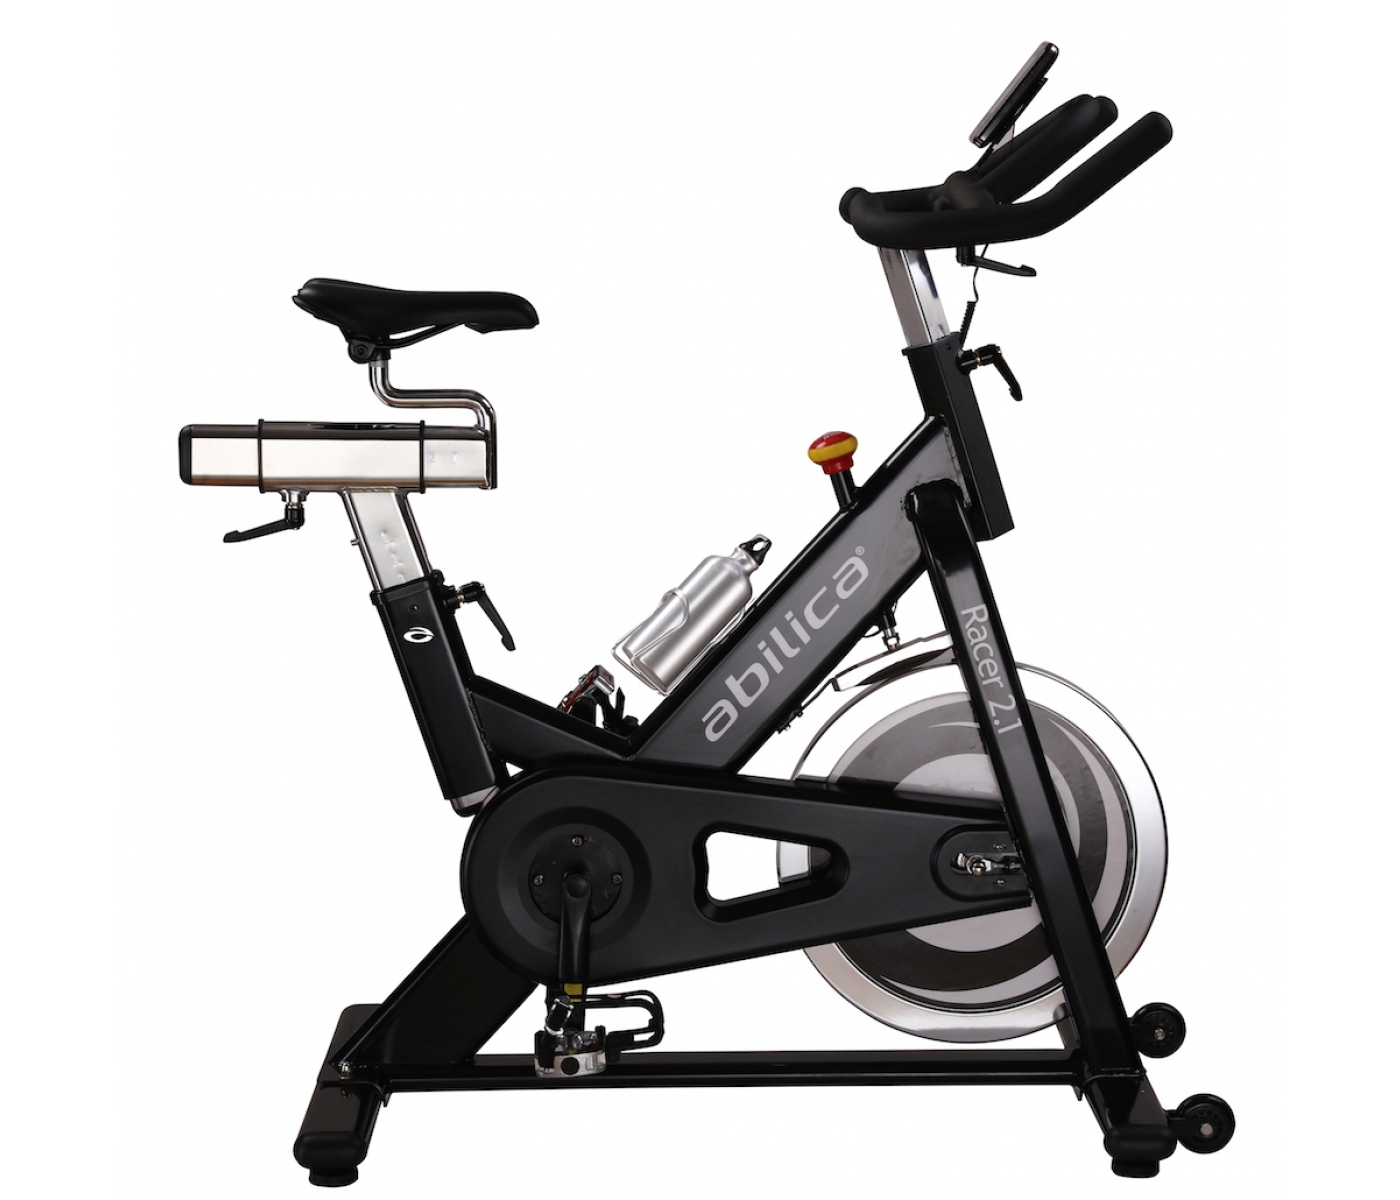 Bedste spinningcykel